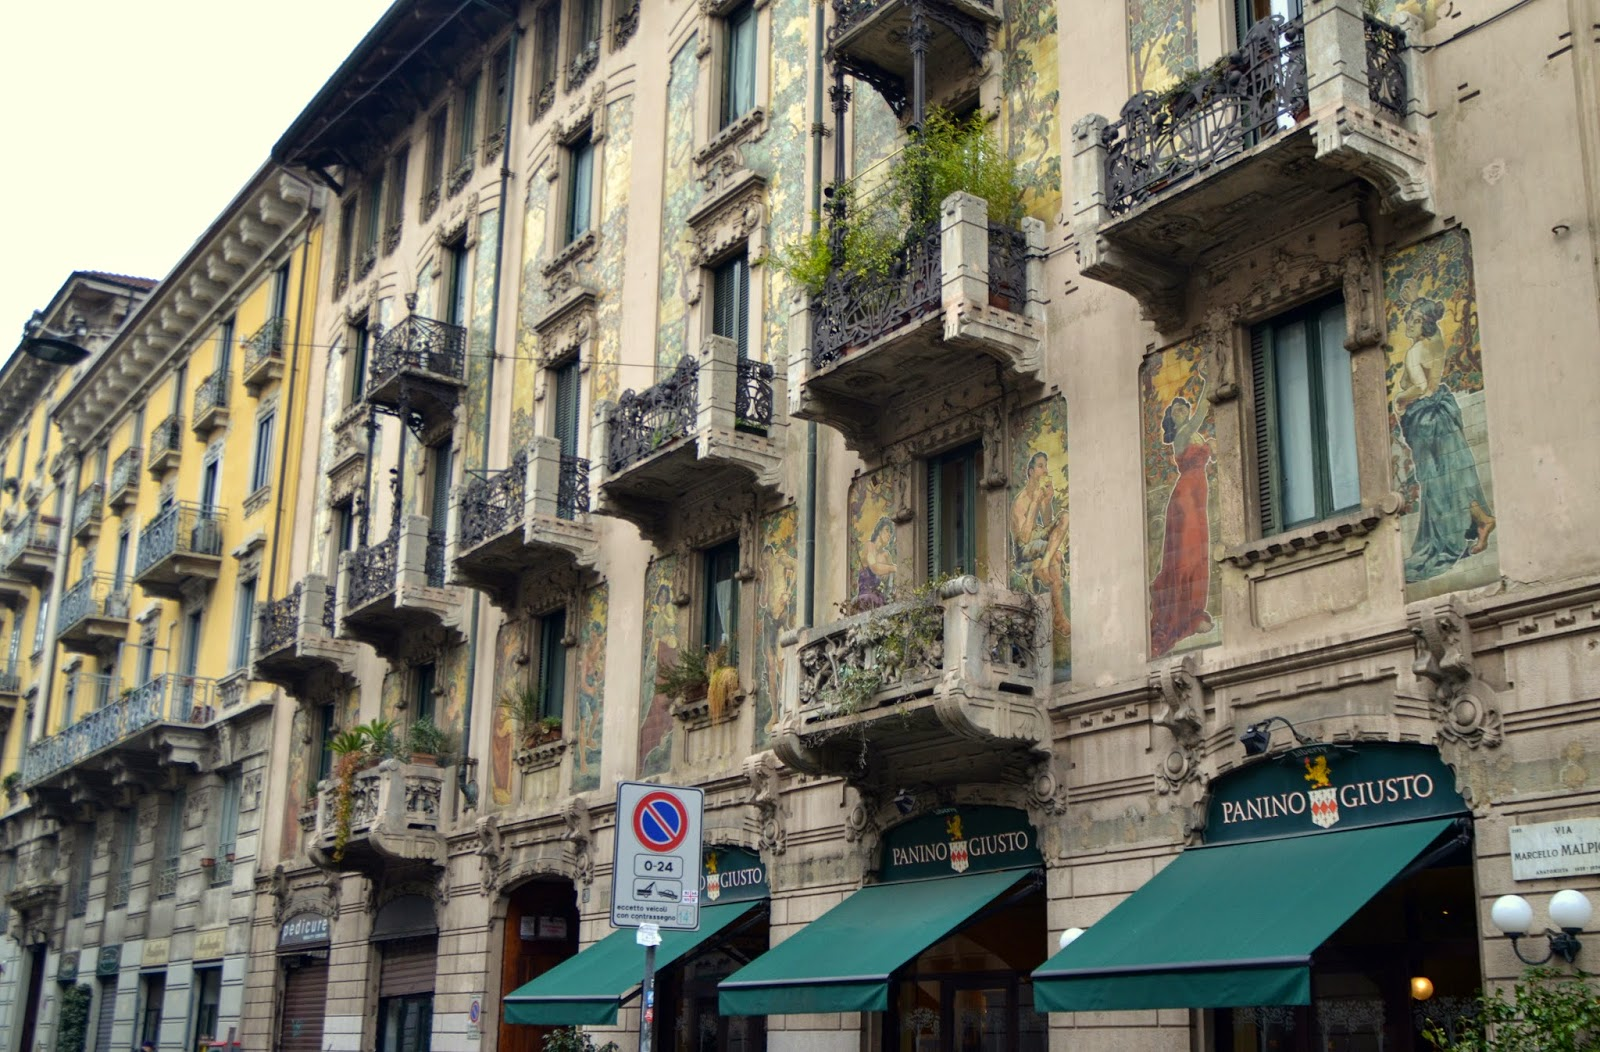 milan-houses-architecture-panino-gusto